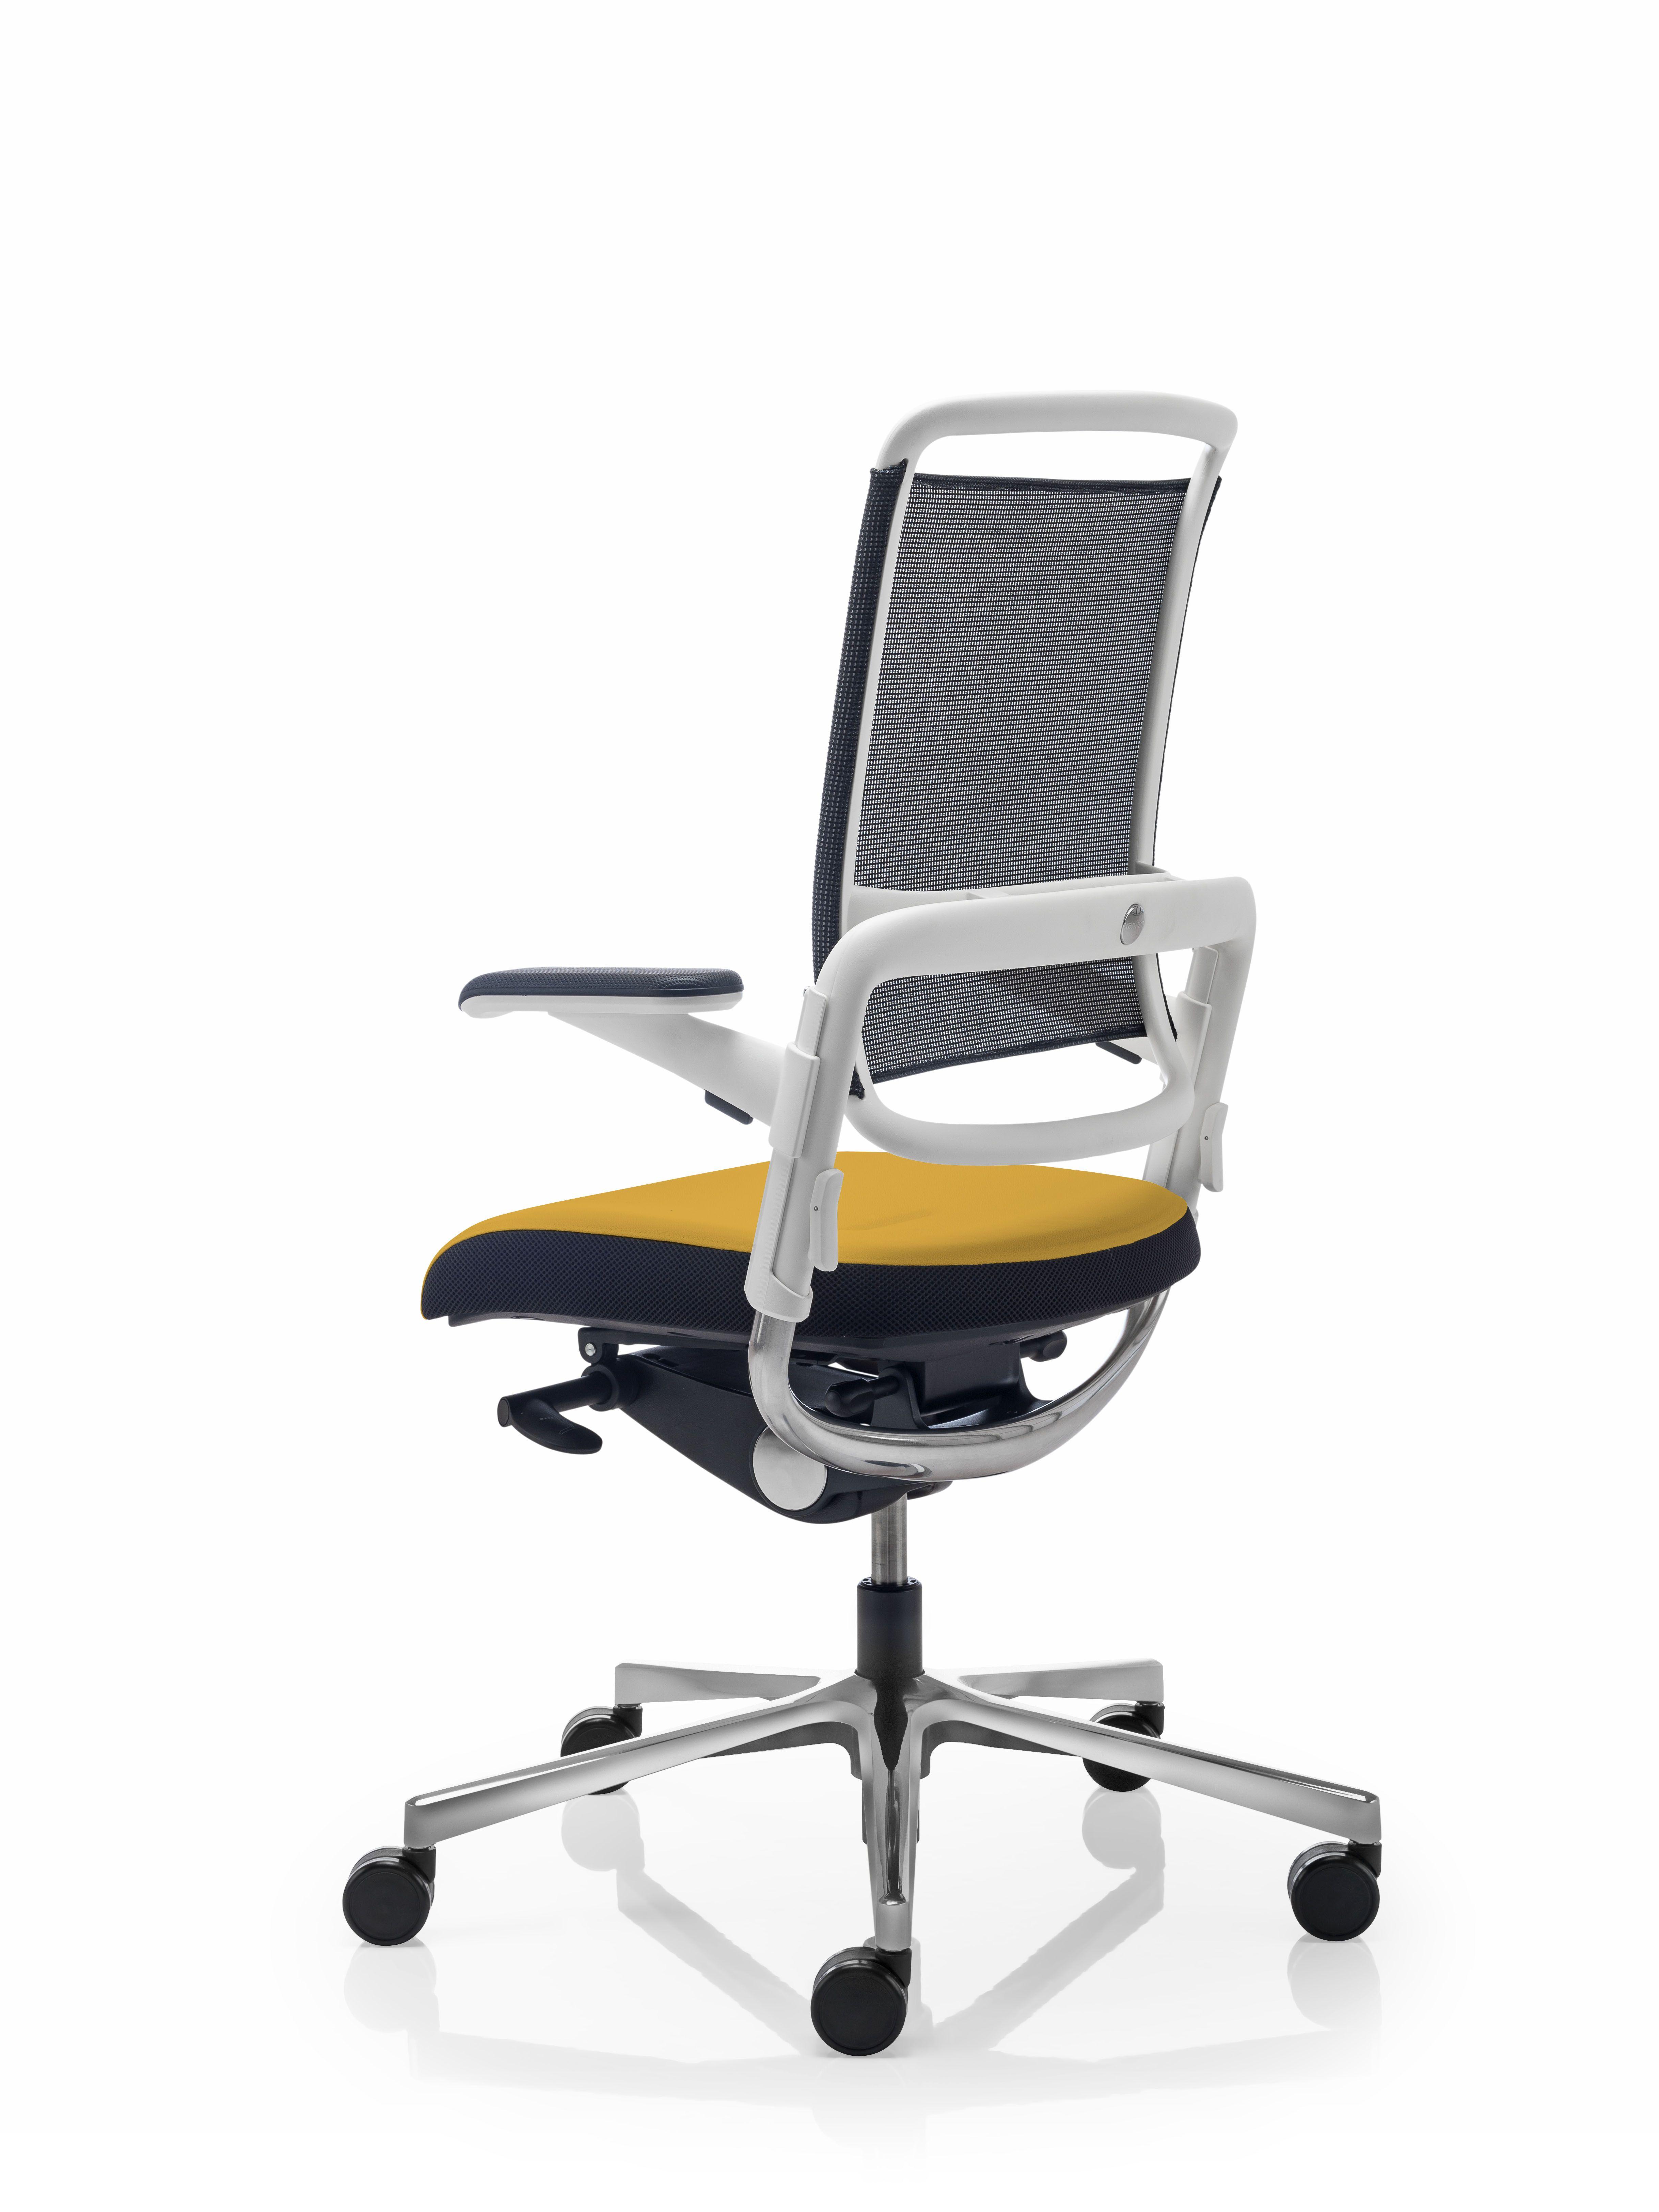 Ergostuhl Buro Augsburg Sessel Stuhl Design Konferenzstuhle